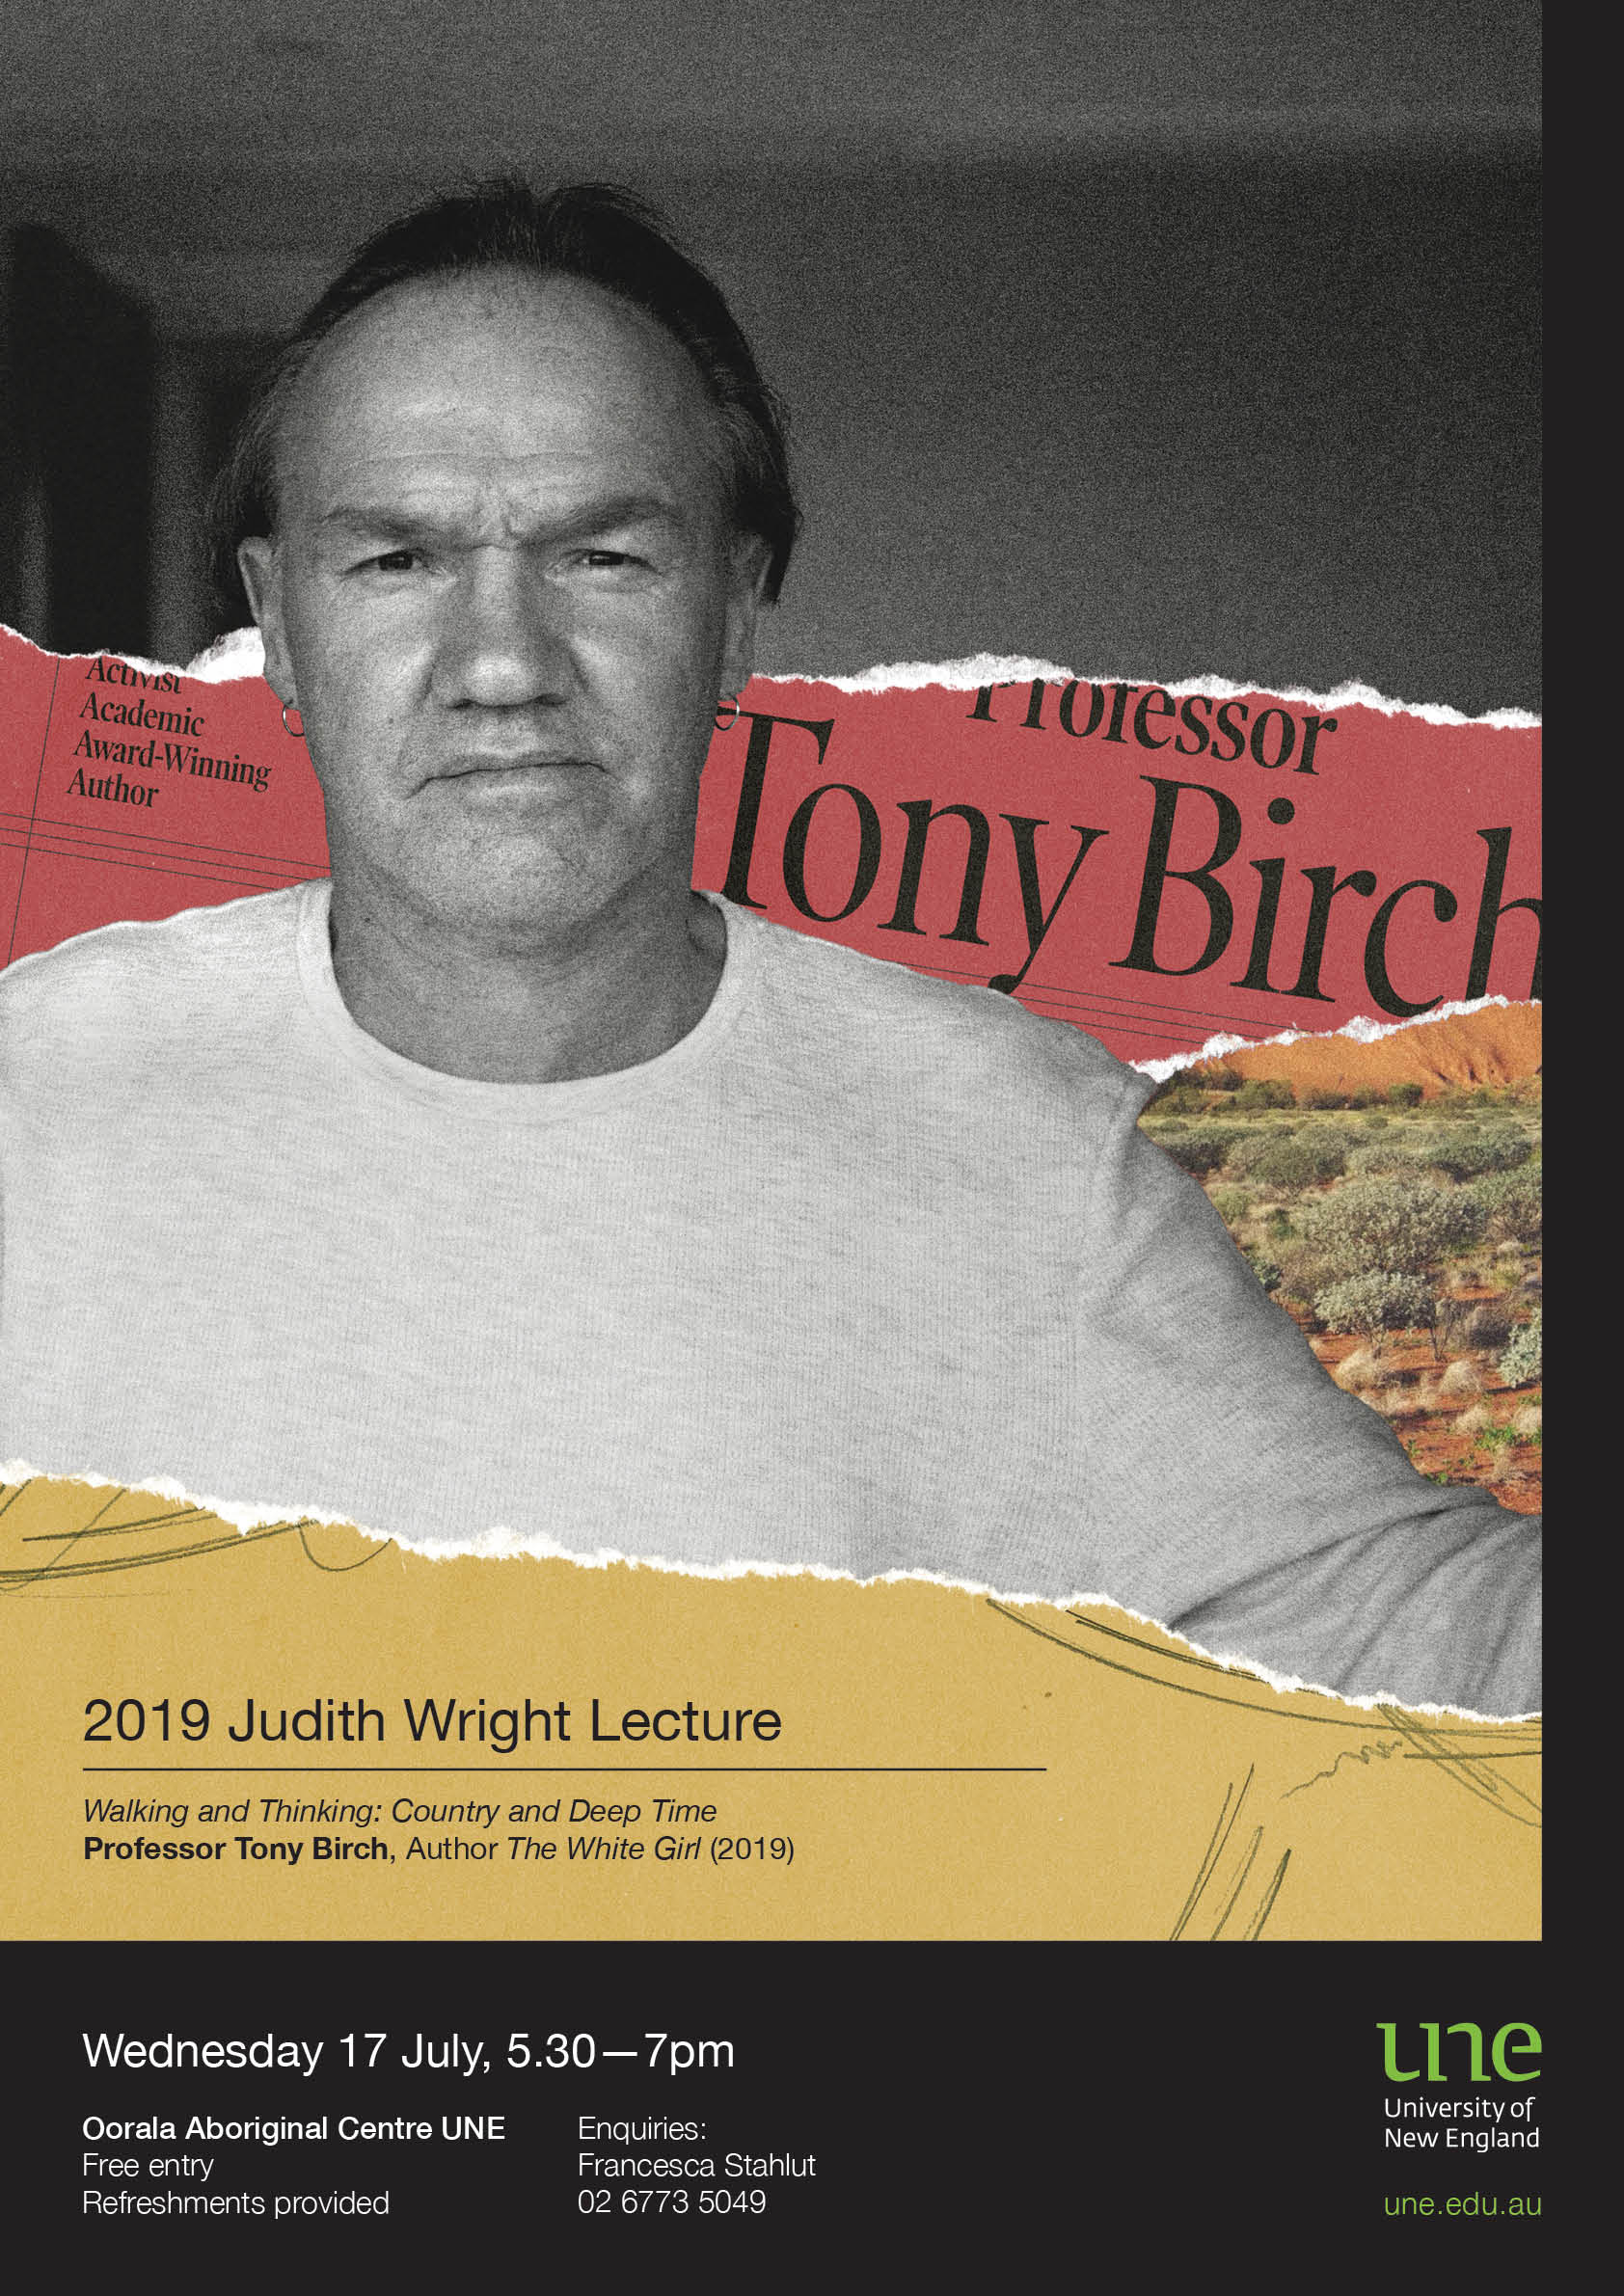 Tony-Birch poster.jpg